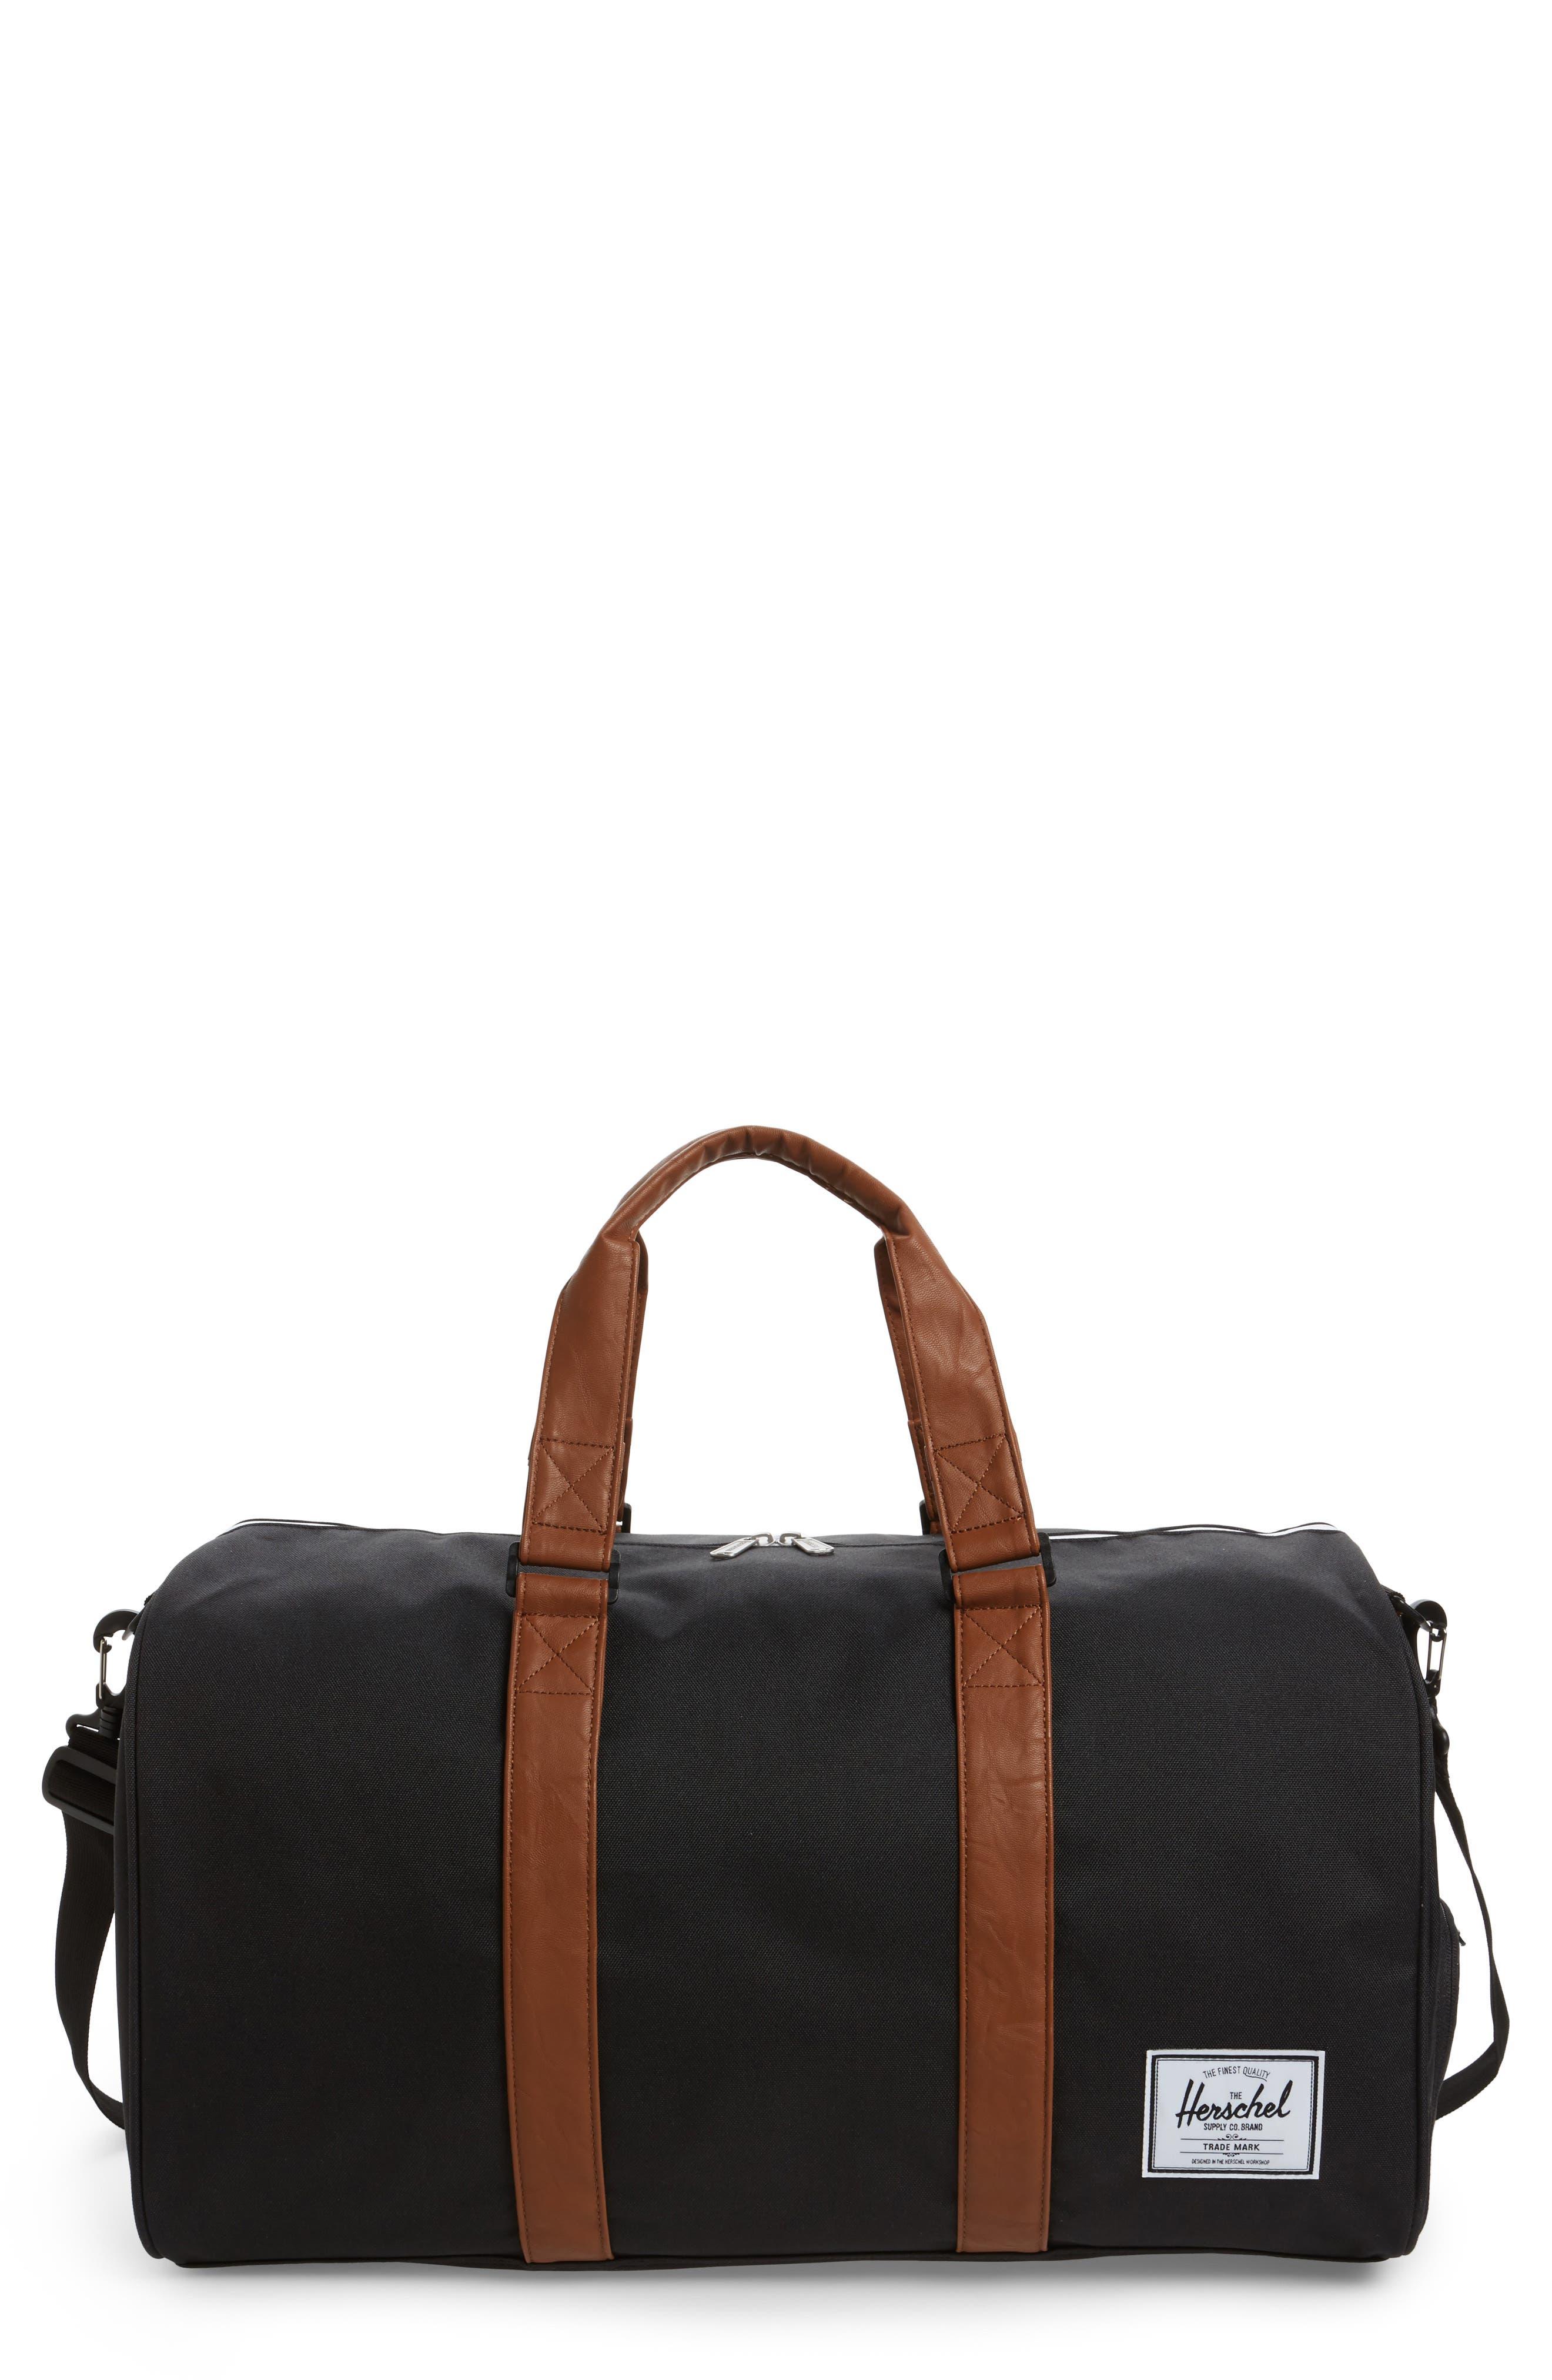 HERSCHEL SUPPLY CO. Novel Duffel Bag, Main, color, BLACK/ TAN